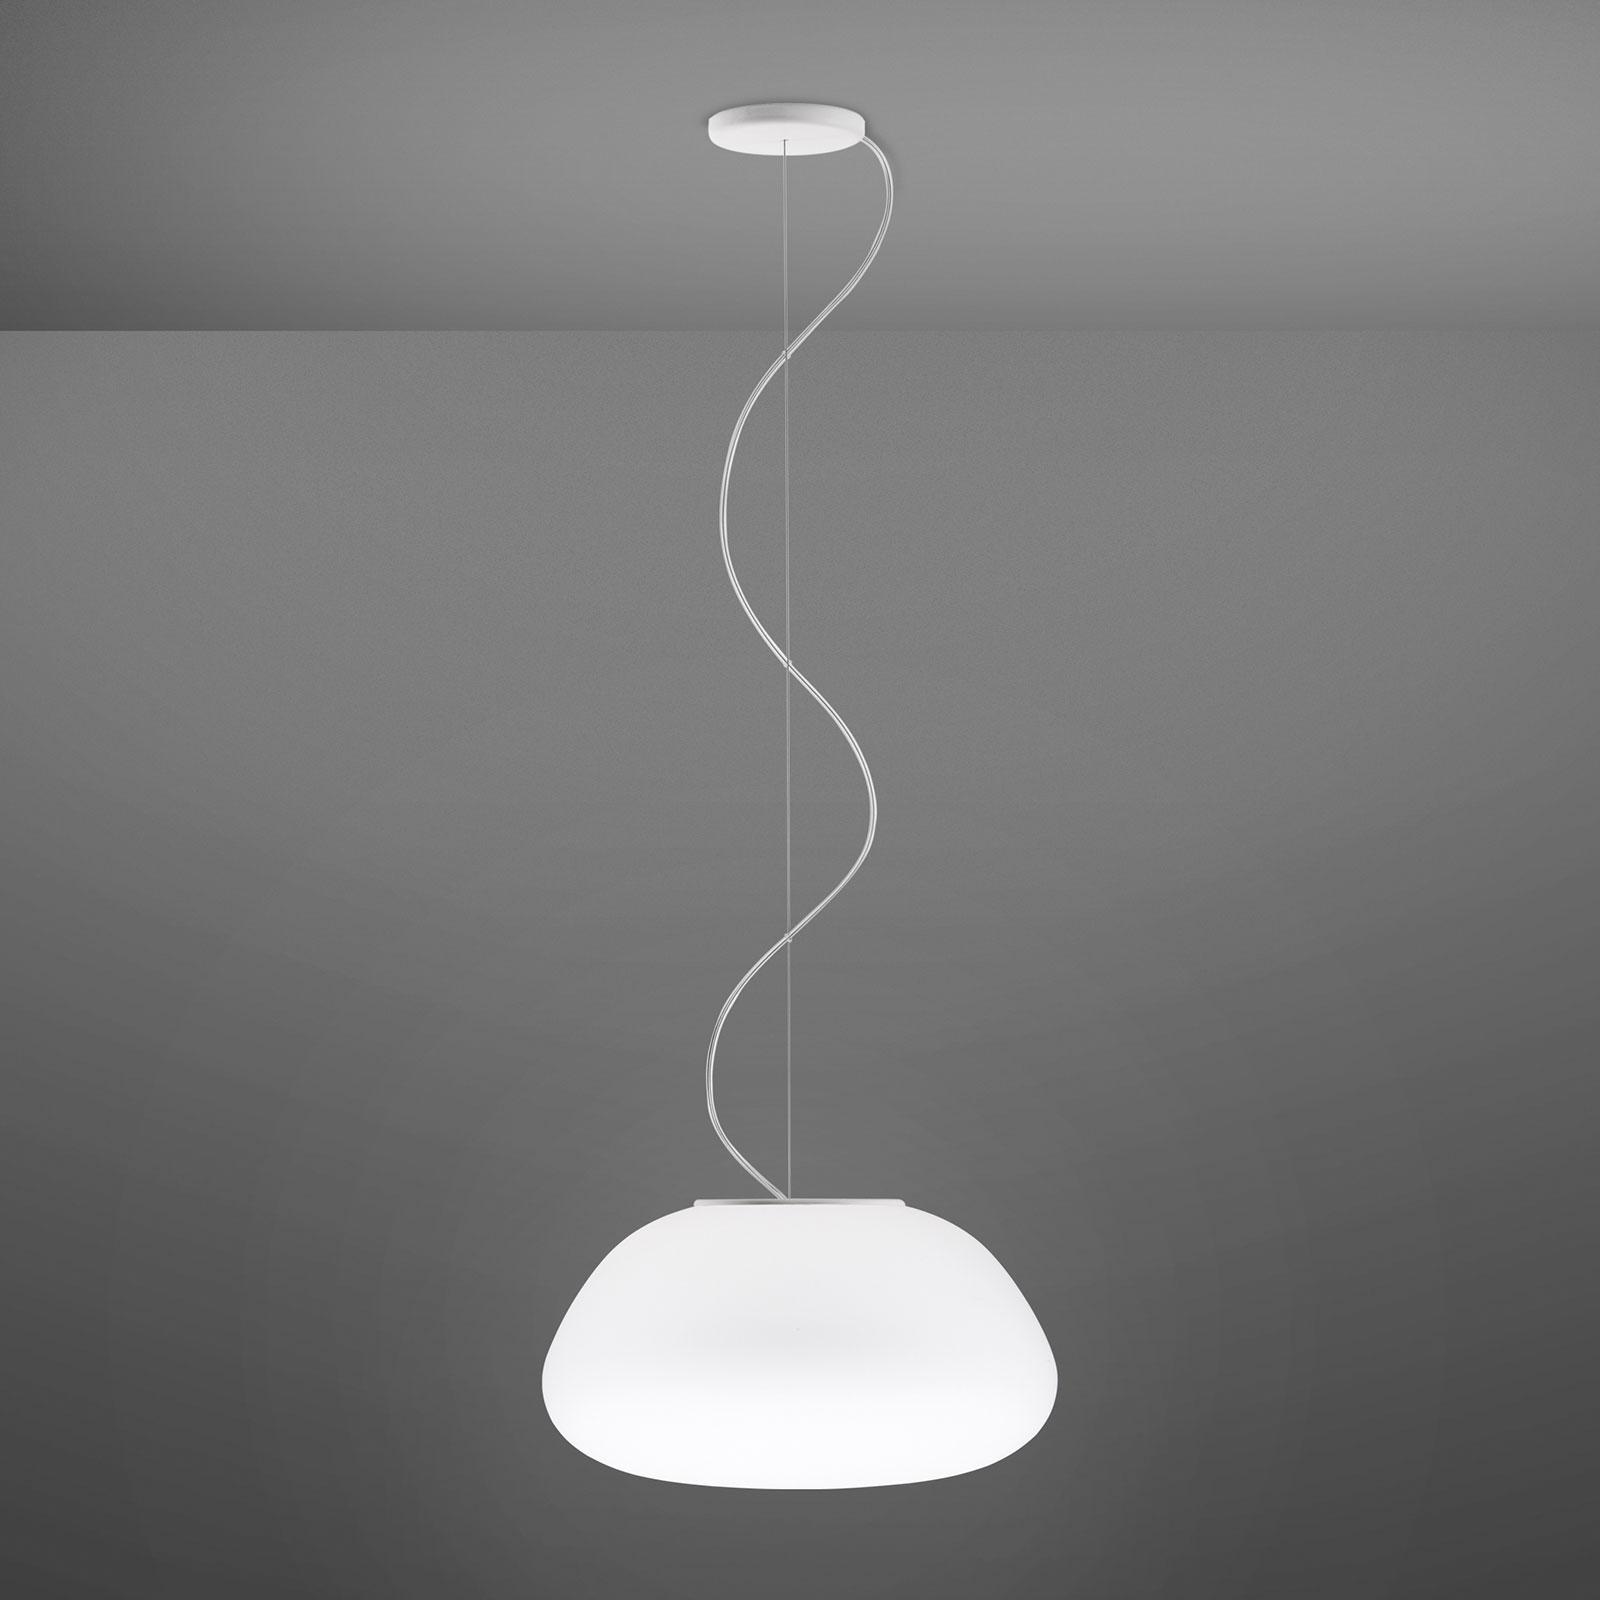 Fabbian Lumi Poga szklana lampa wisząca, Ø 42 cm